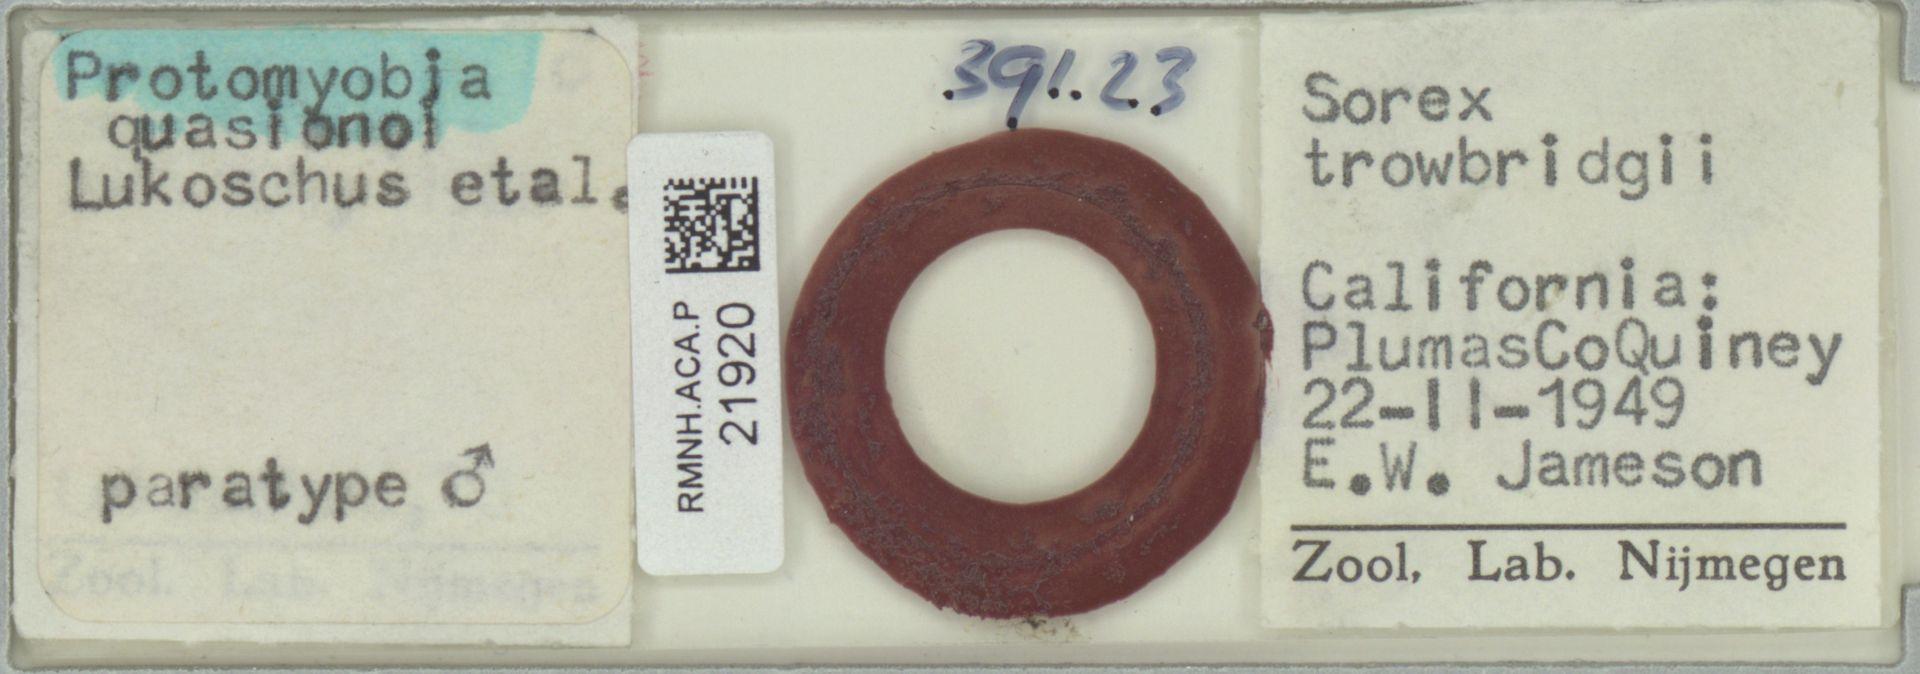 RMNH.ACA.P.21920 | Protomyobia quasionoi Lukoschus etal.